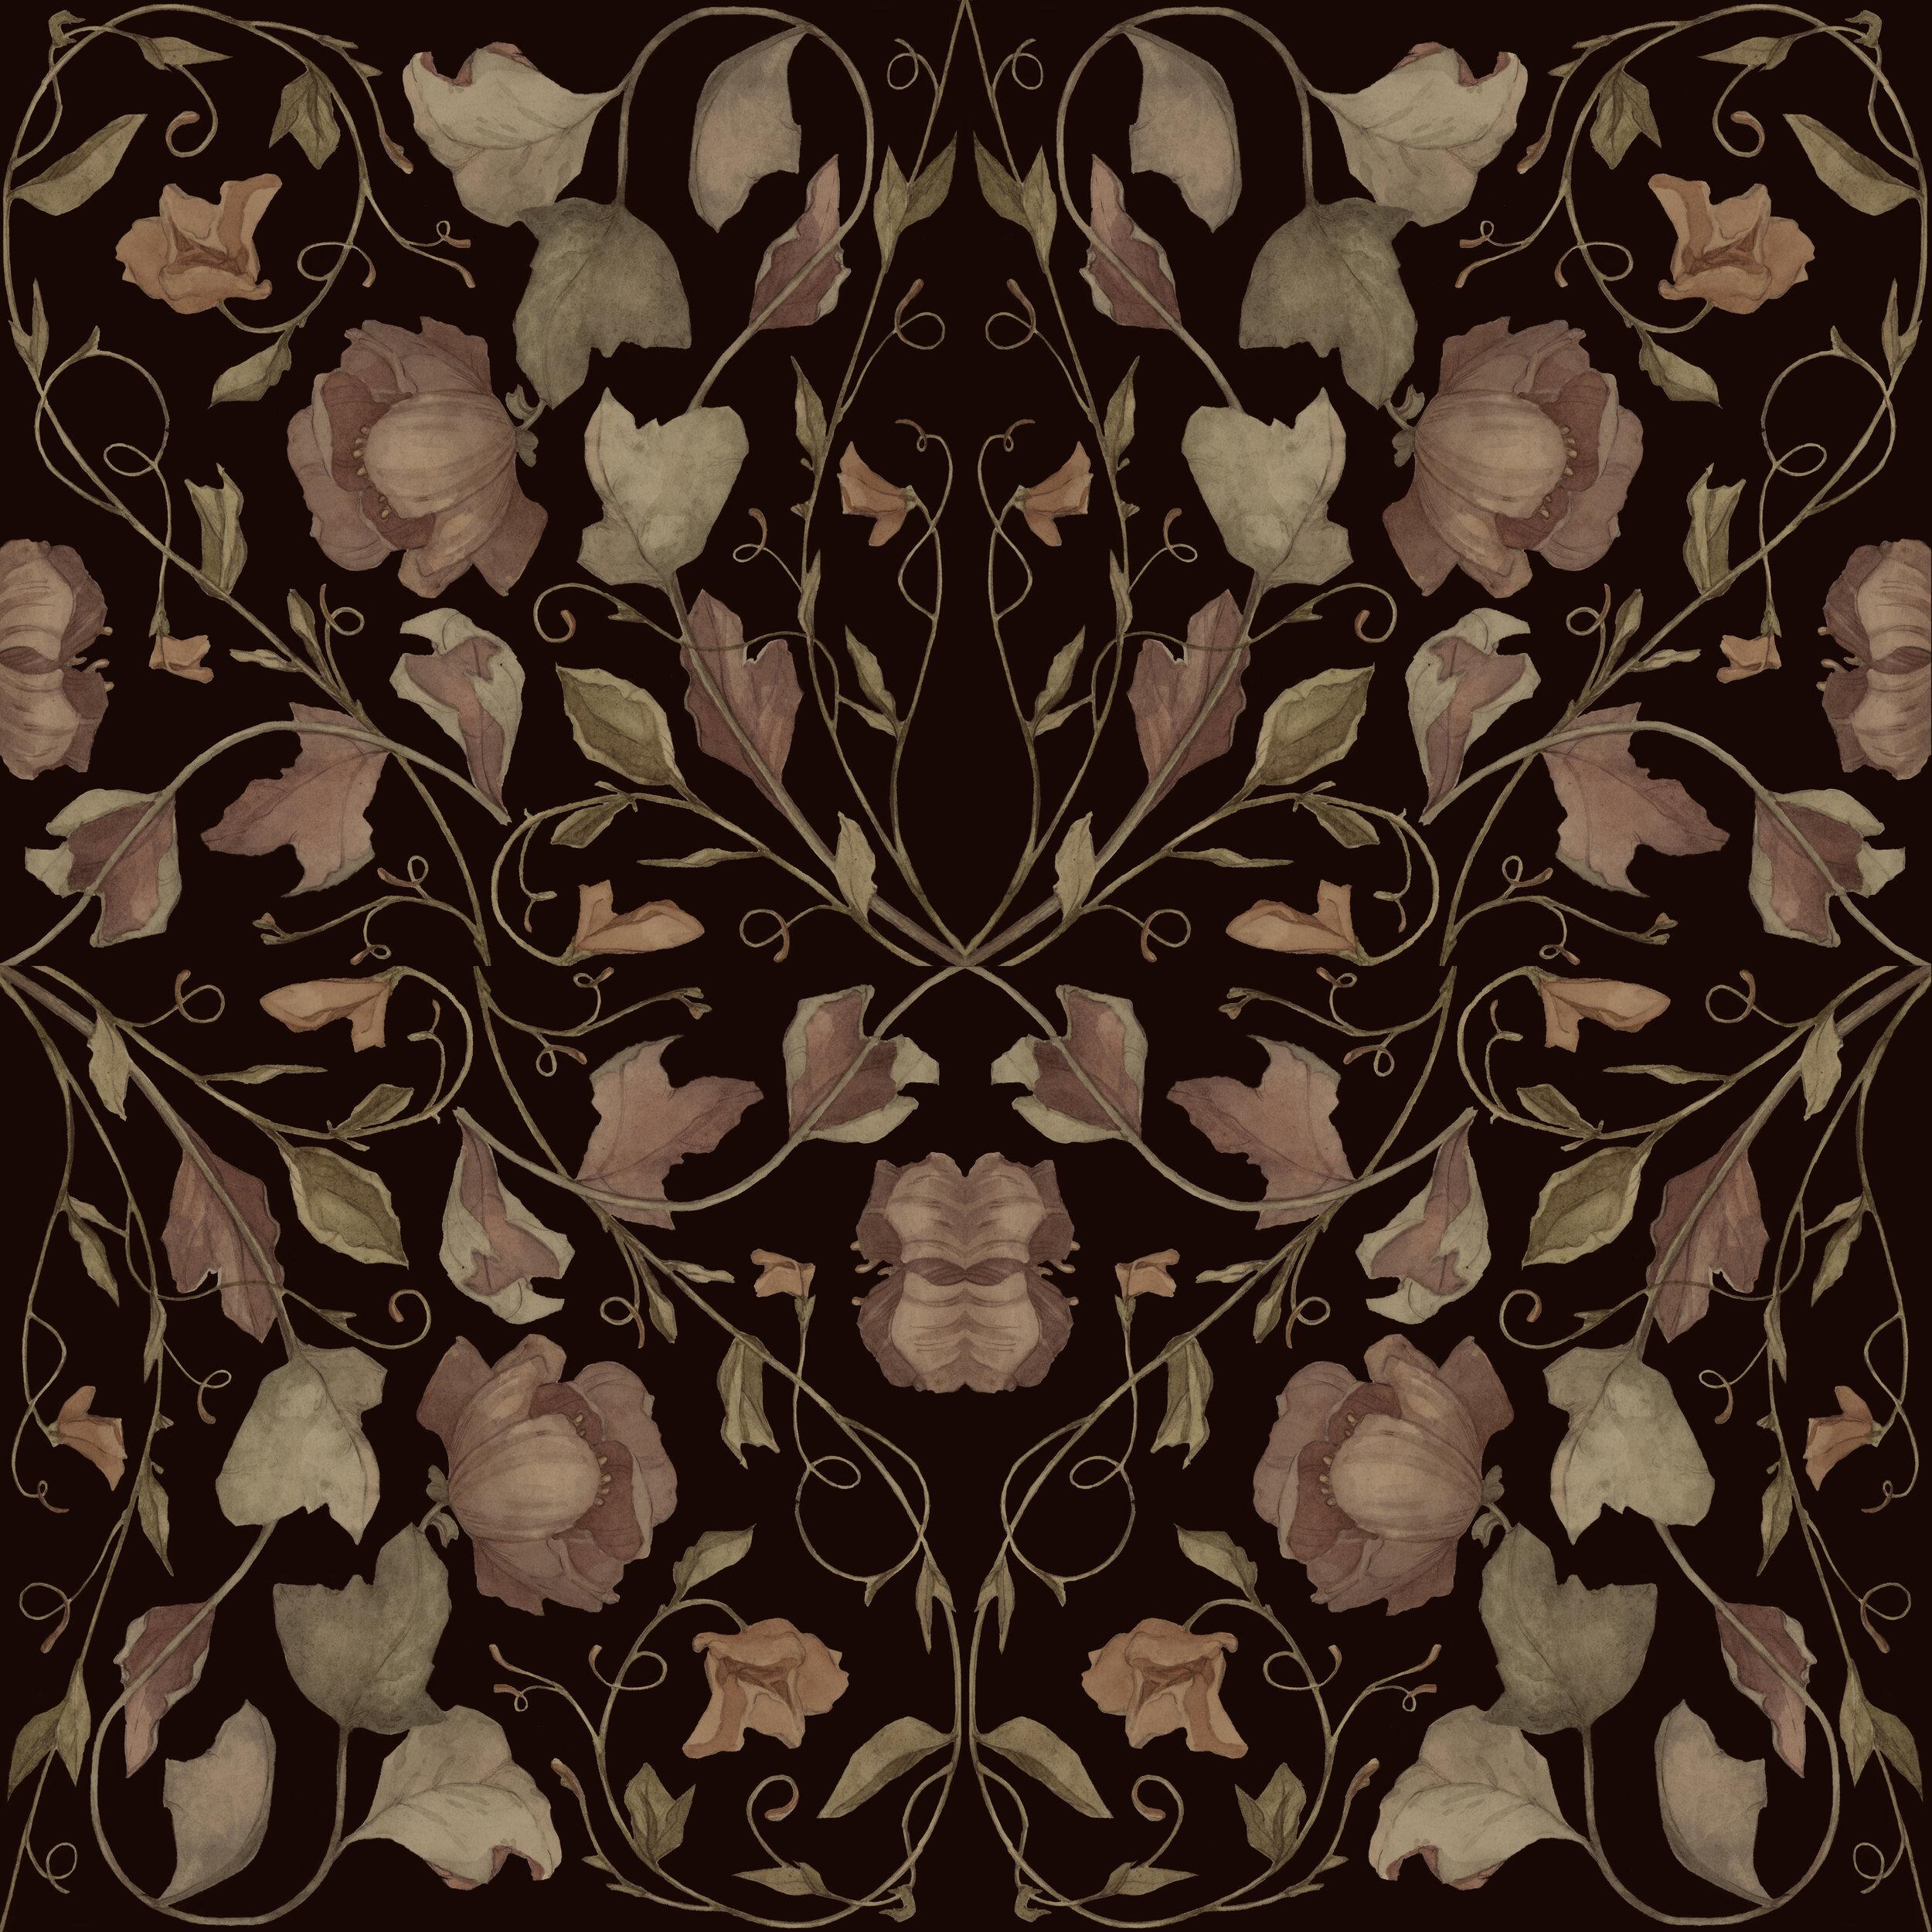 wallpapercolor(2)small.jpg